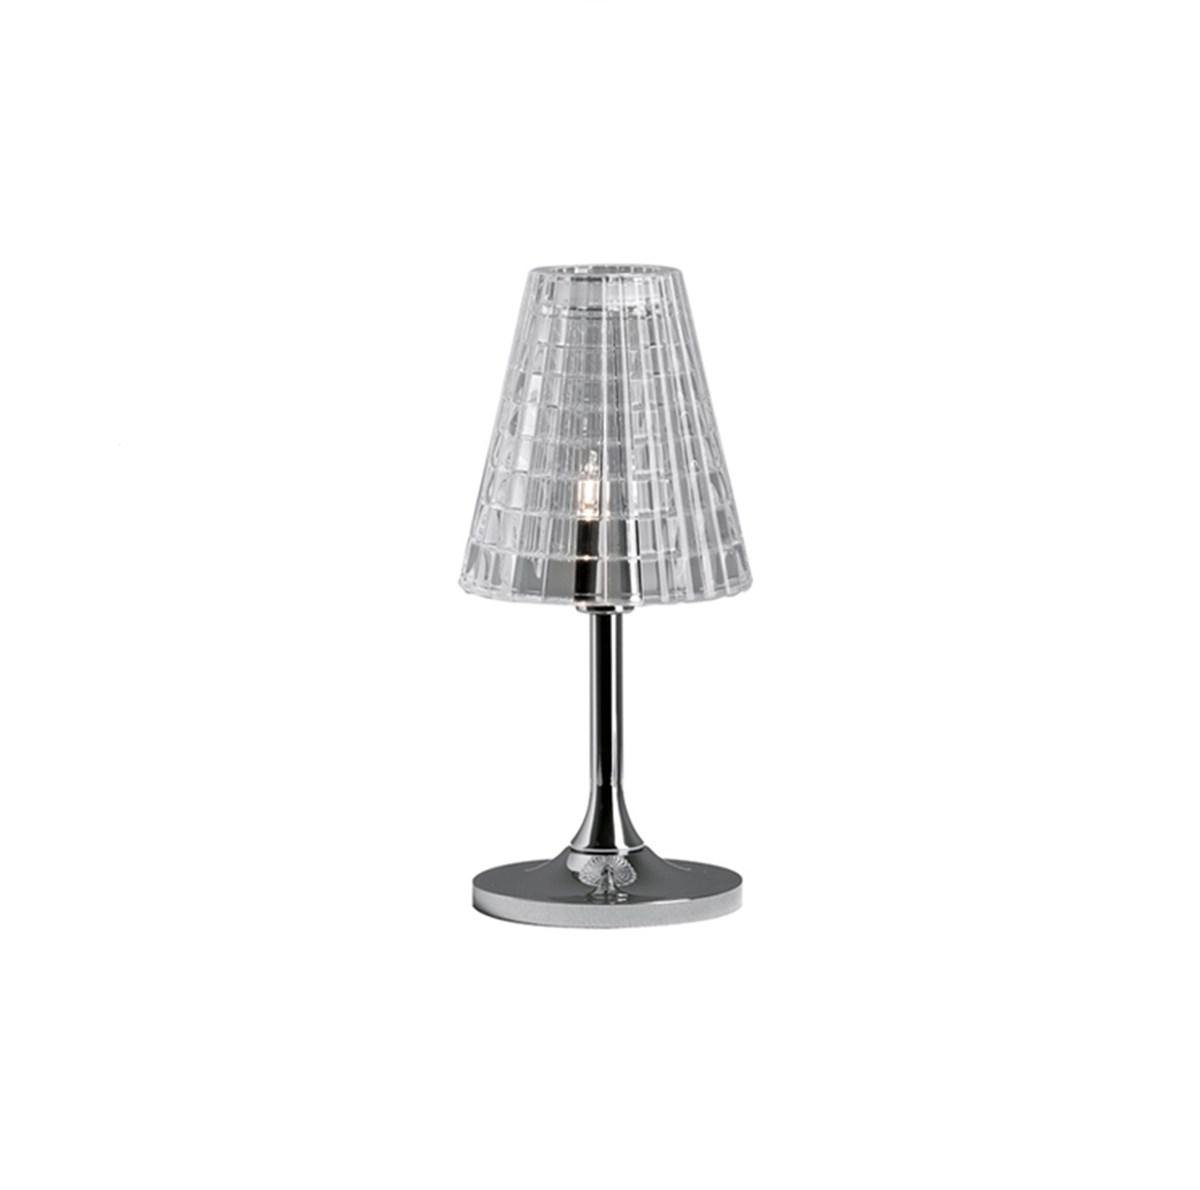 Fabbian-Nicola-Design-Flow-Table-Light-Matisse-1